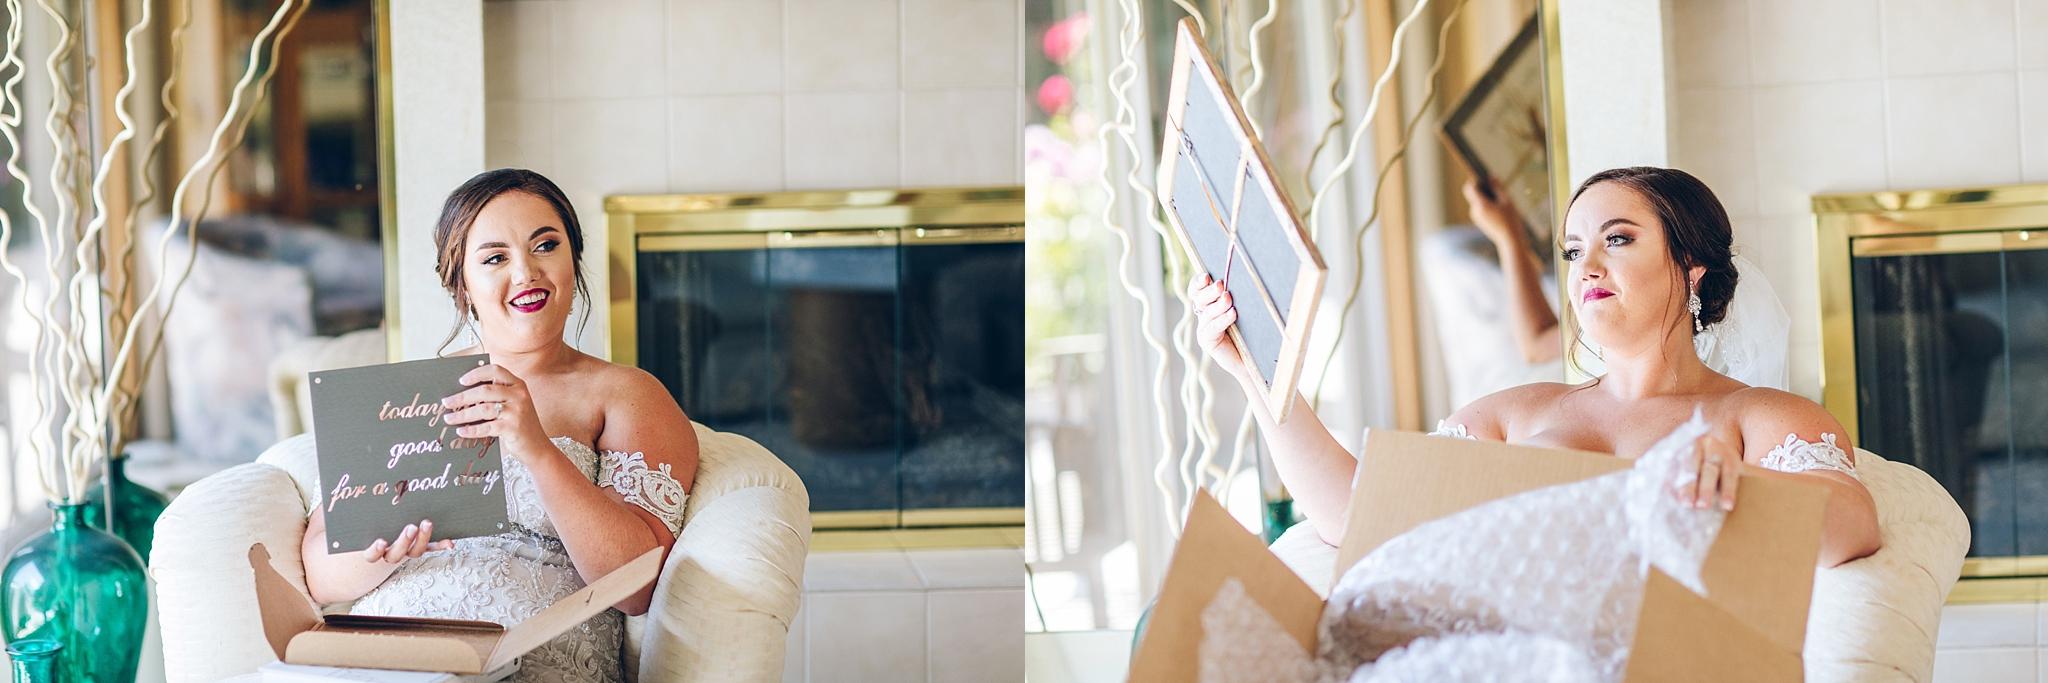 baker-lofts-holland-michigan-wedding-photographer_0318.jpg